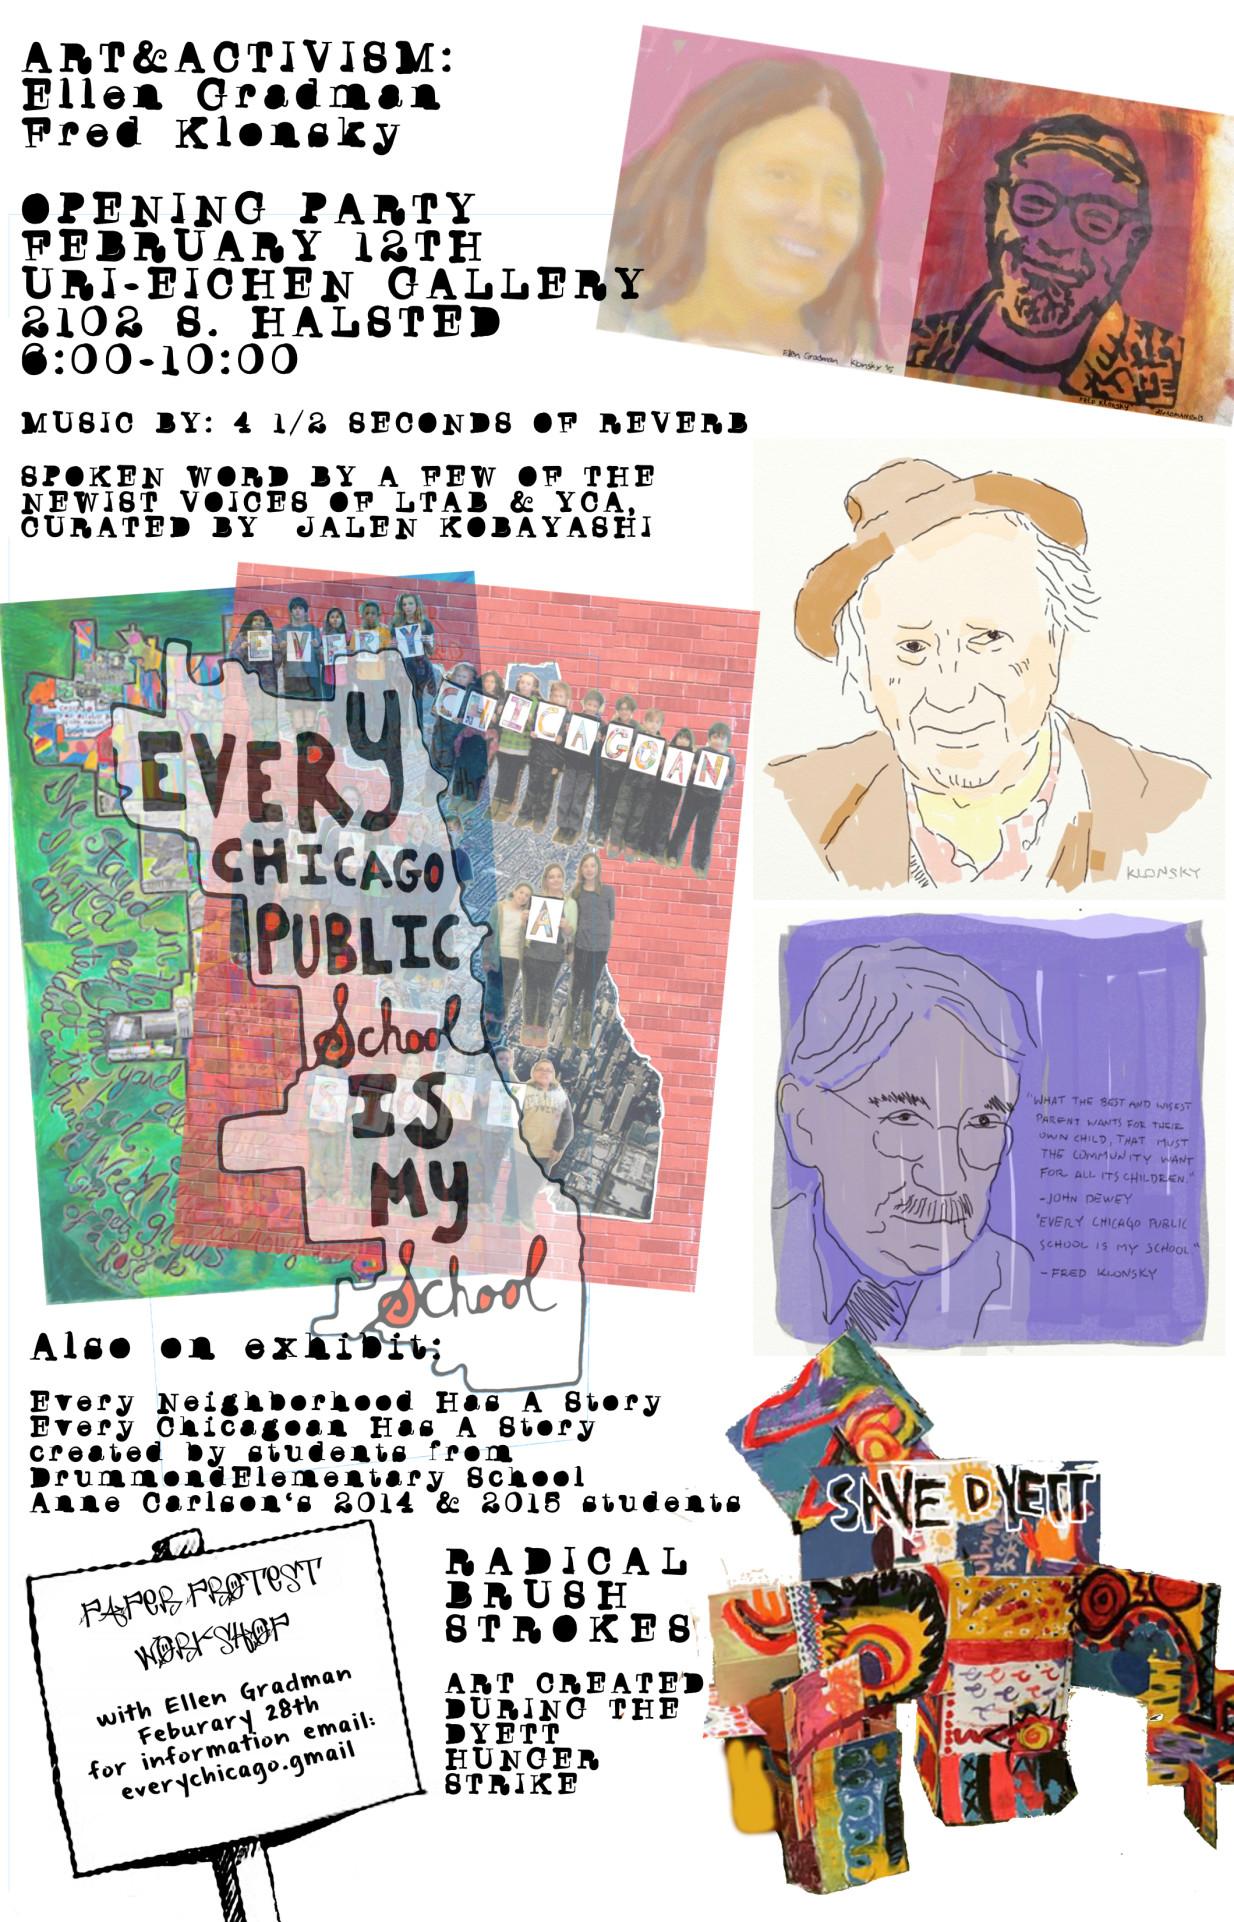 Art & Activism Show